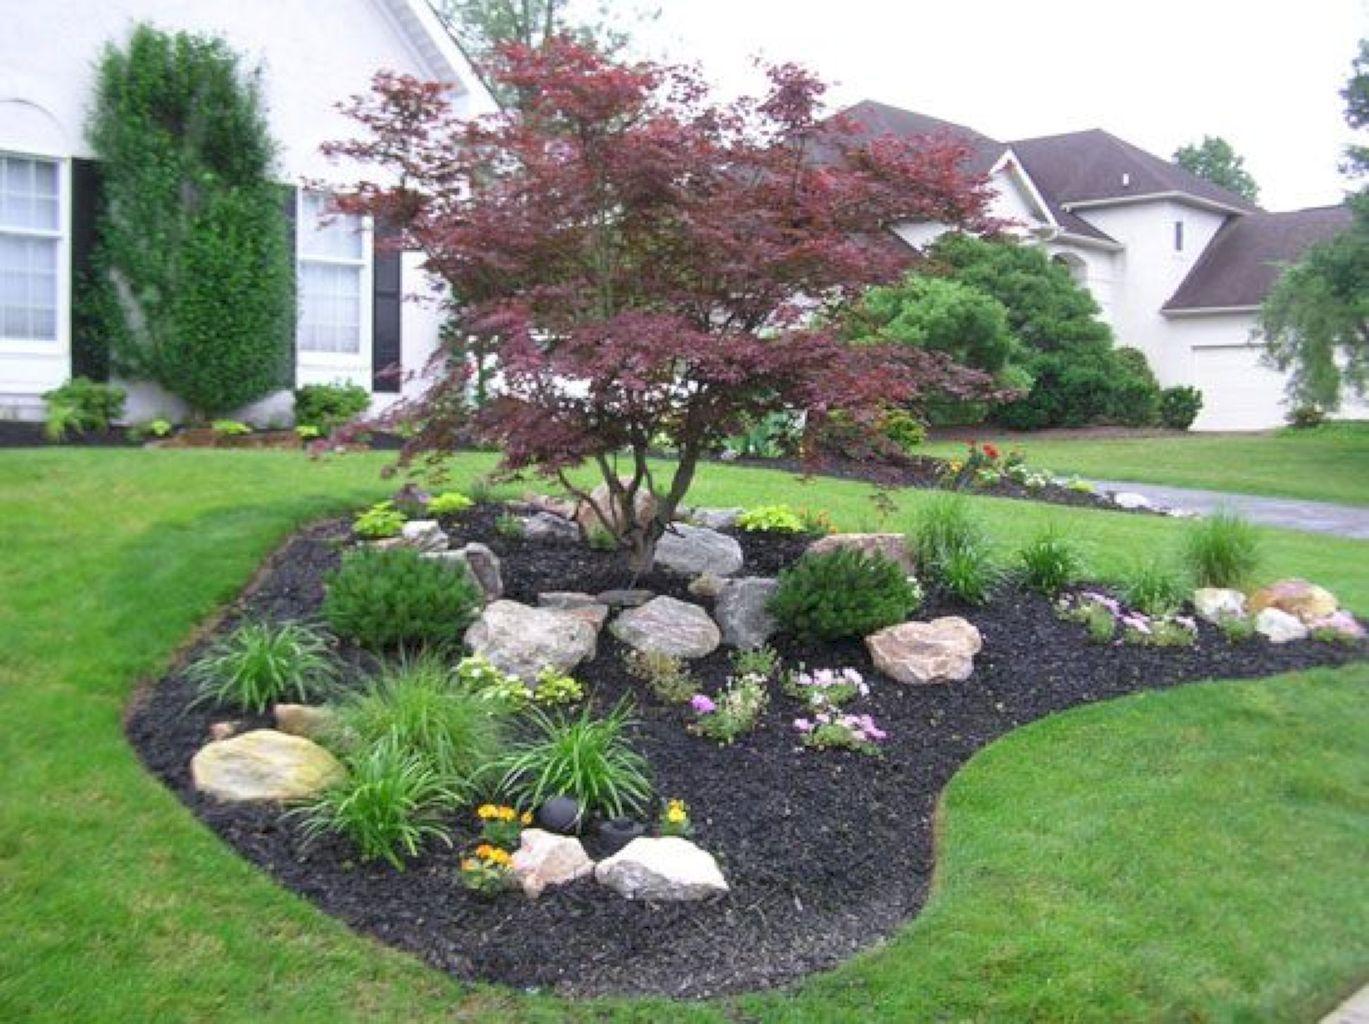 54 beautiful front yard rock garden ideas large yard Small Front Yard Rock Garden Ideas id=40437